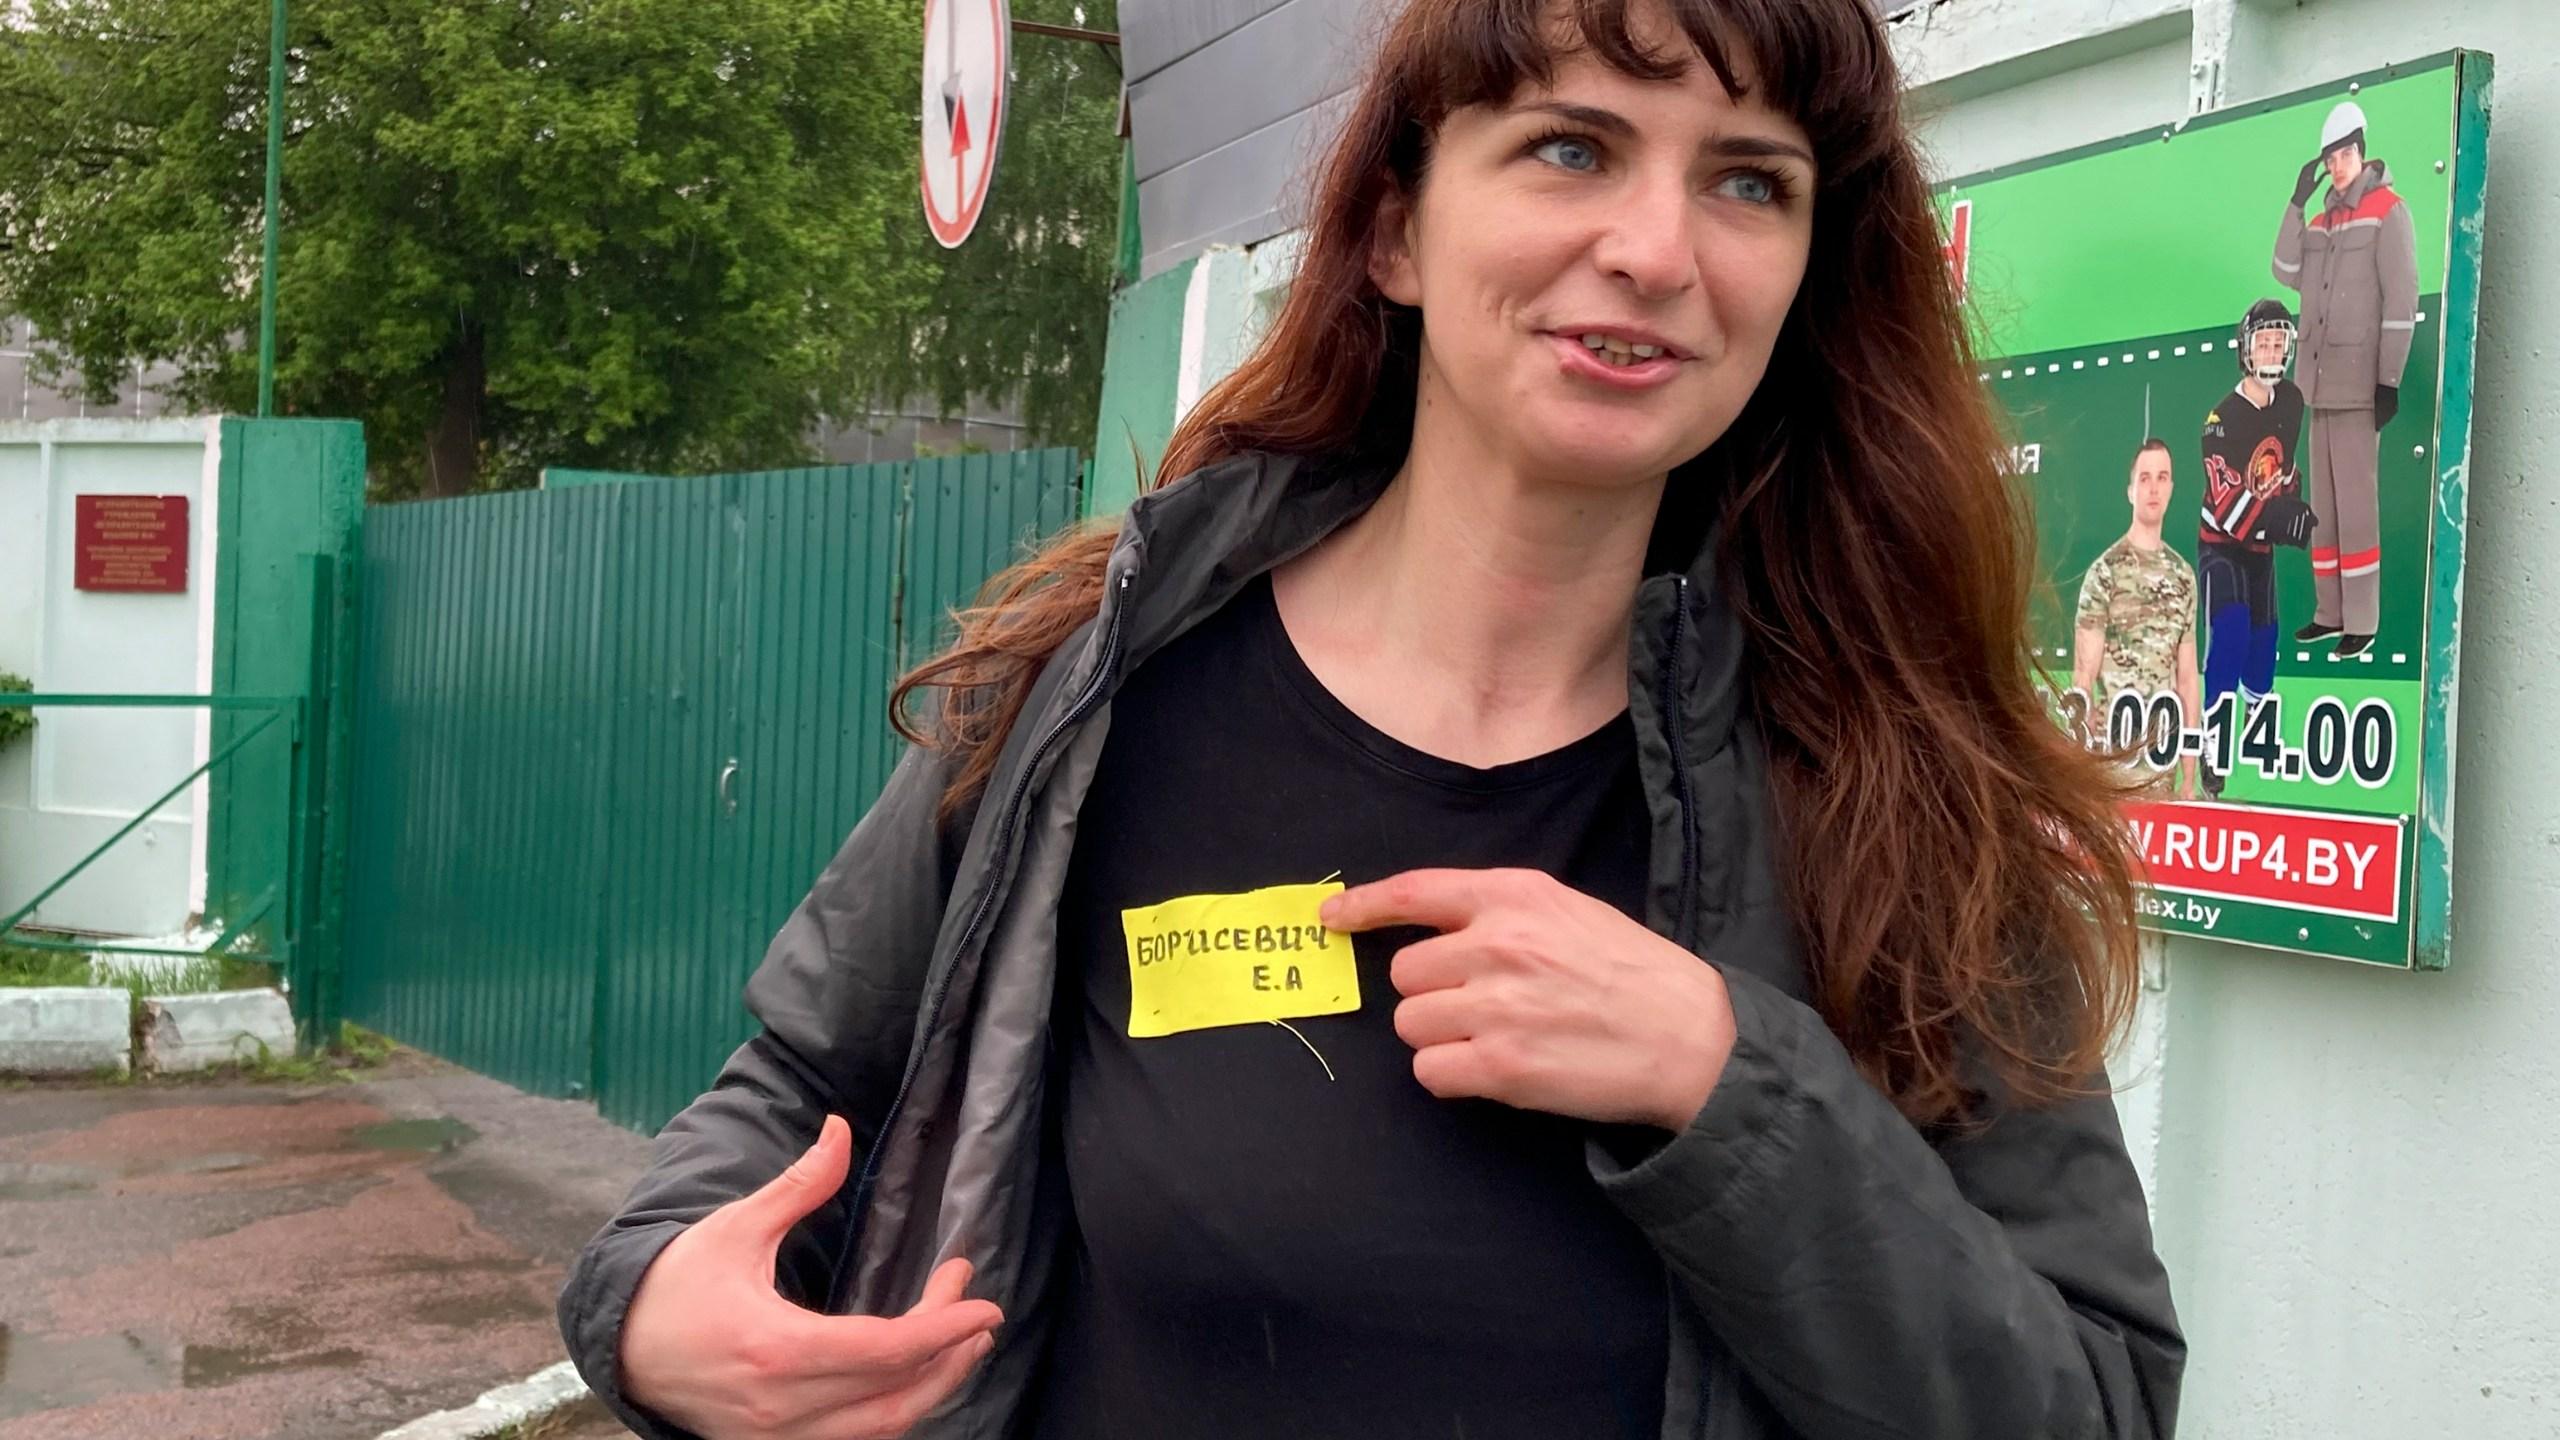 Katsiaryna Barysevich